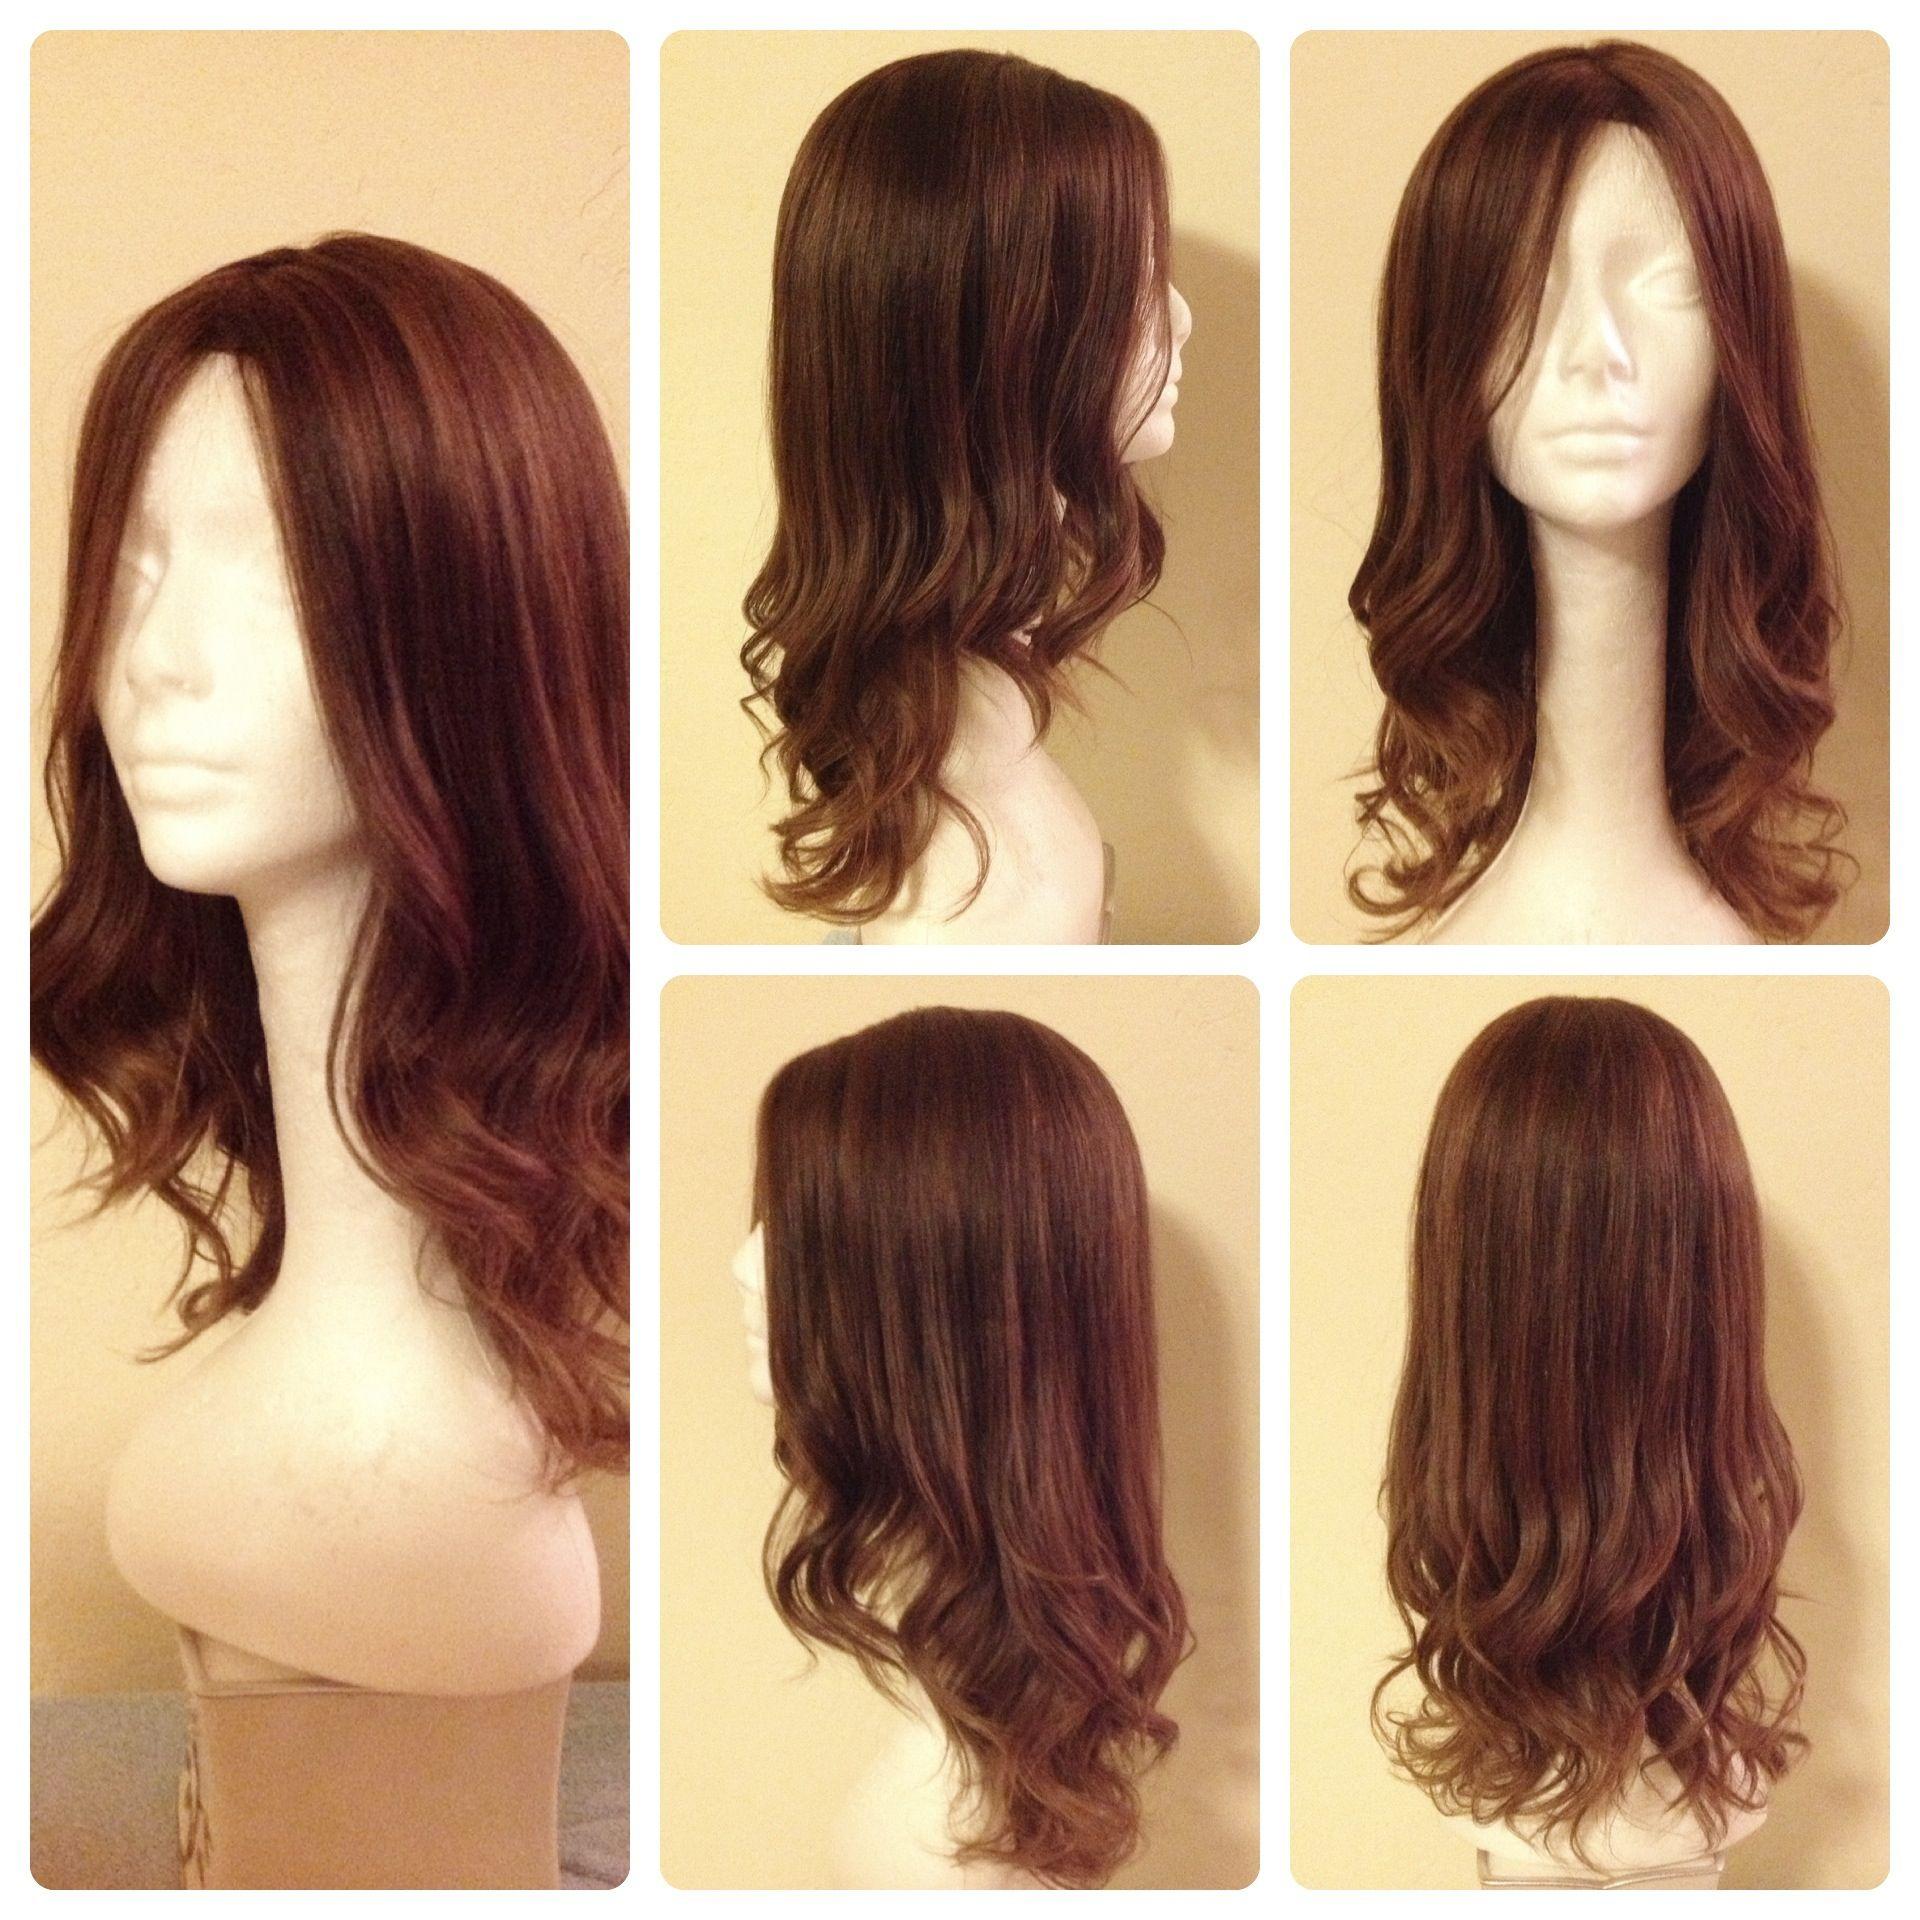 Long Straight Fall Loose Curls At The Bottom Romantic Curling Straight Hair Medium Brown Hair Hair